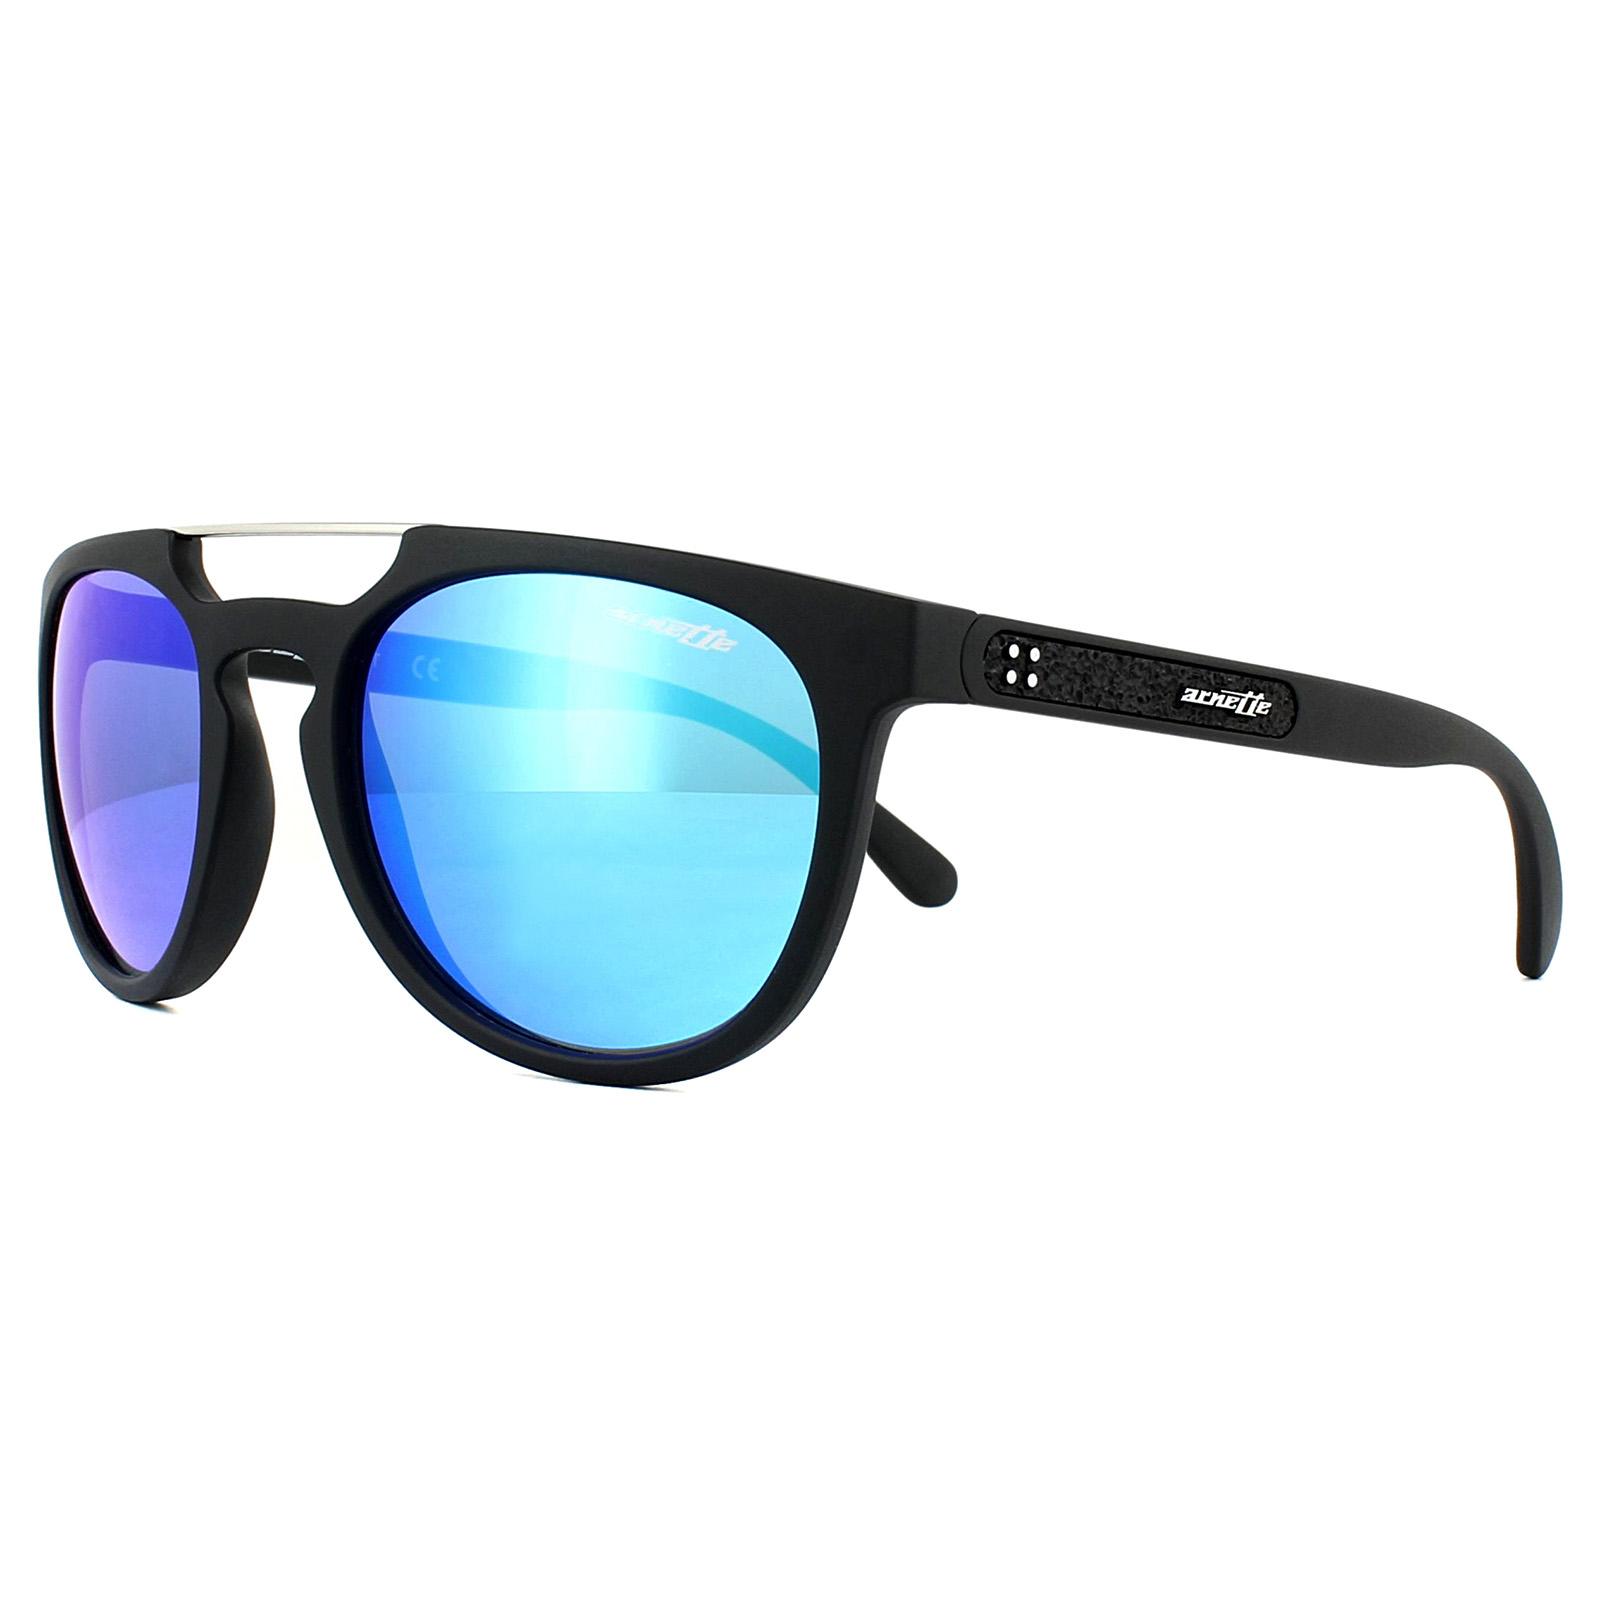 e01d10f6696 Sentinel Arnette Sunglasses Woodward 4237 01 25 Matt Black Blue Mirror